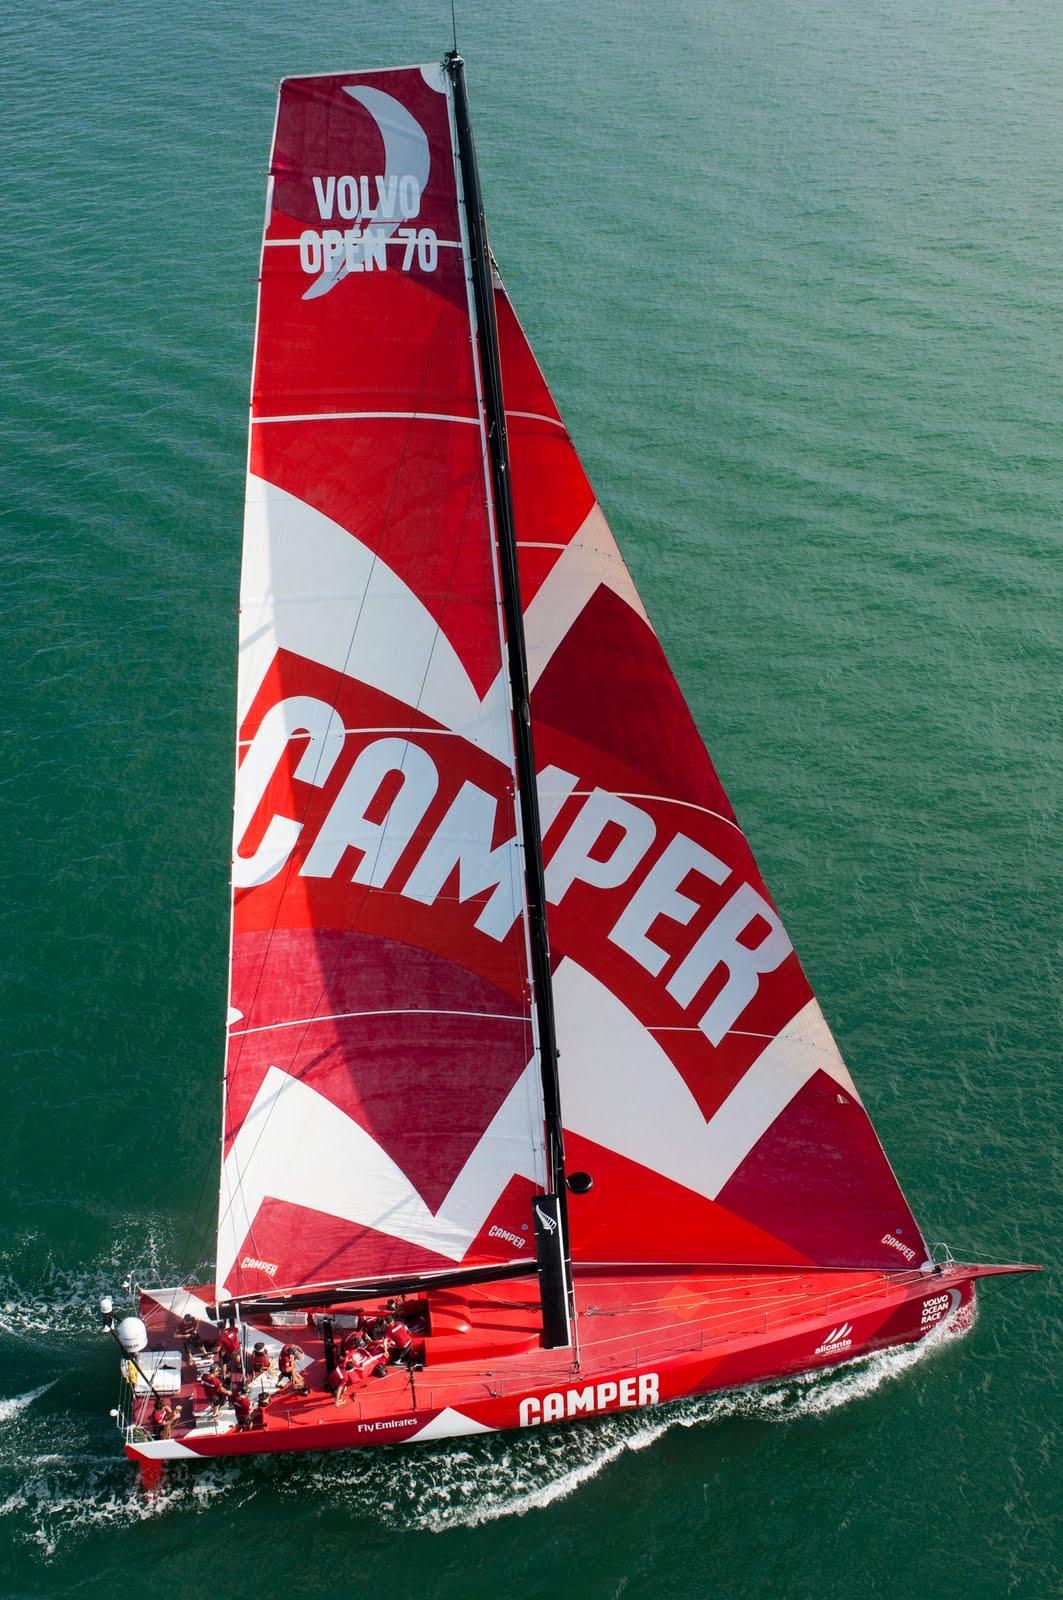 new Camper VO70 yacht.